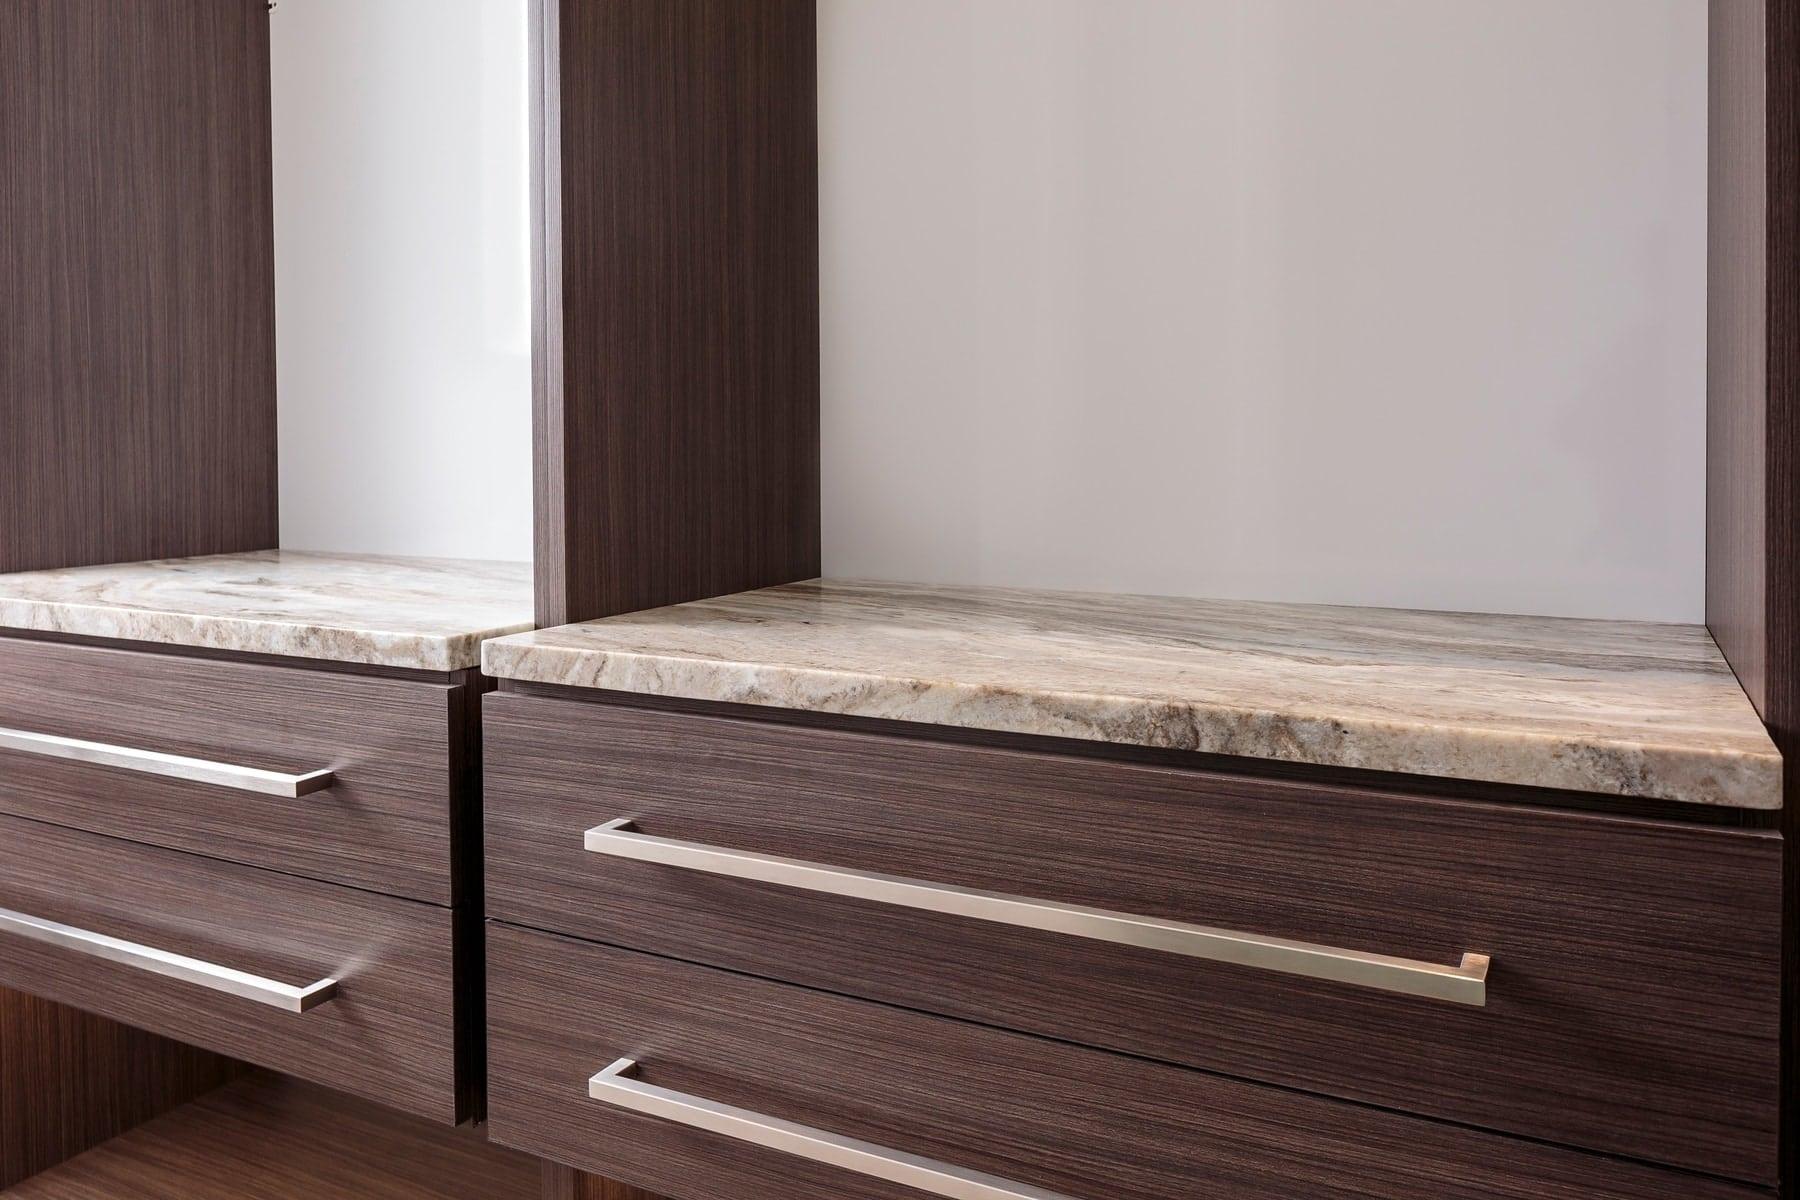 custom drawers in a schmalenbach wardrobe designed by eggersmann in the model unit of arabella luxury condos in houston